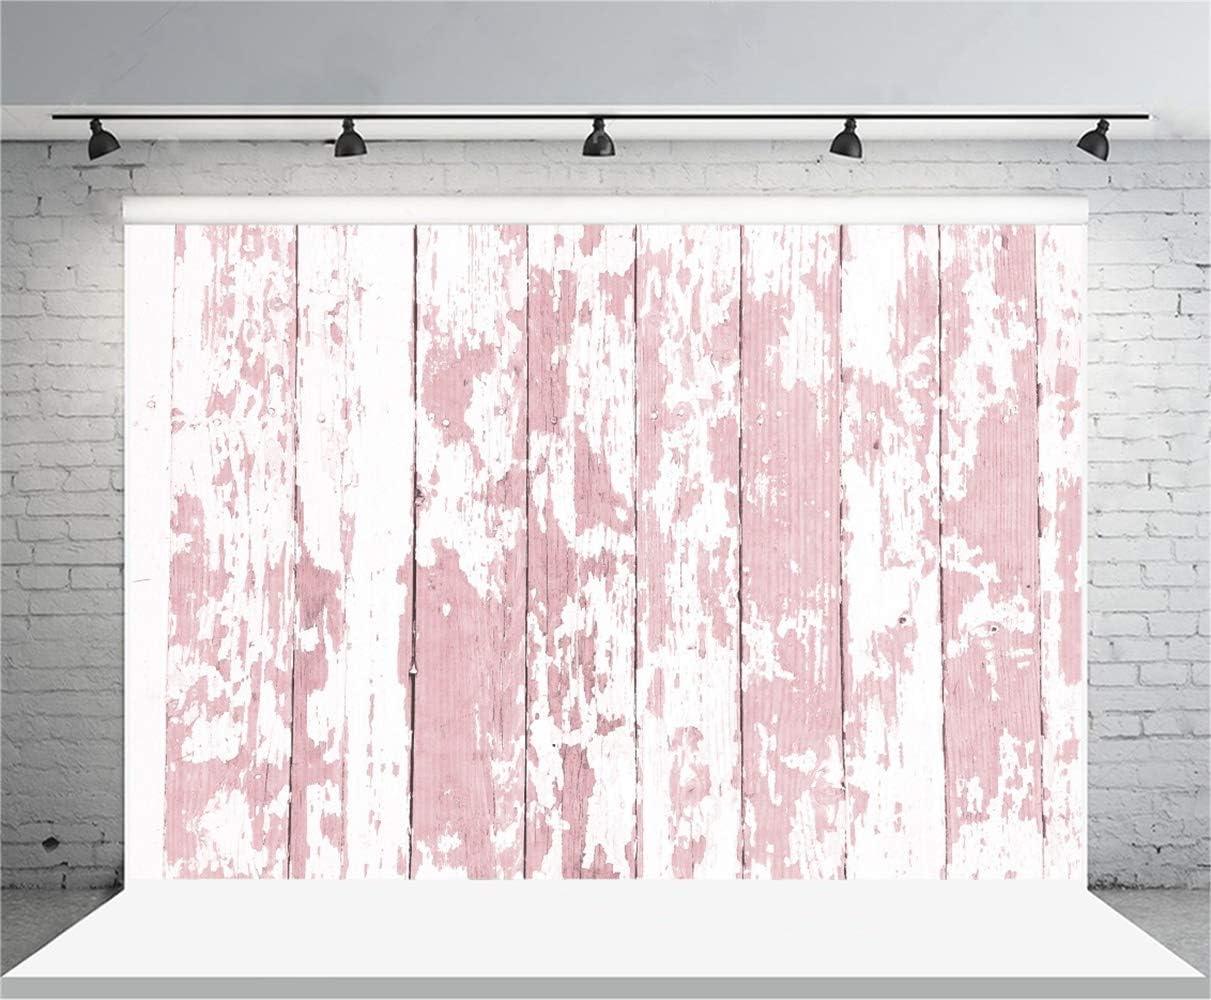 GoEoo 10x7ft Grunge Peeling Pink Wooden Board Backdrop Vinyl Mottled Faded Rustic Vertical Striped Wood Plank Background Child Adult Artistic Portrait Kids Clothes Shoot Event Banner Studio